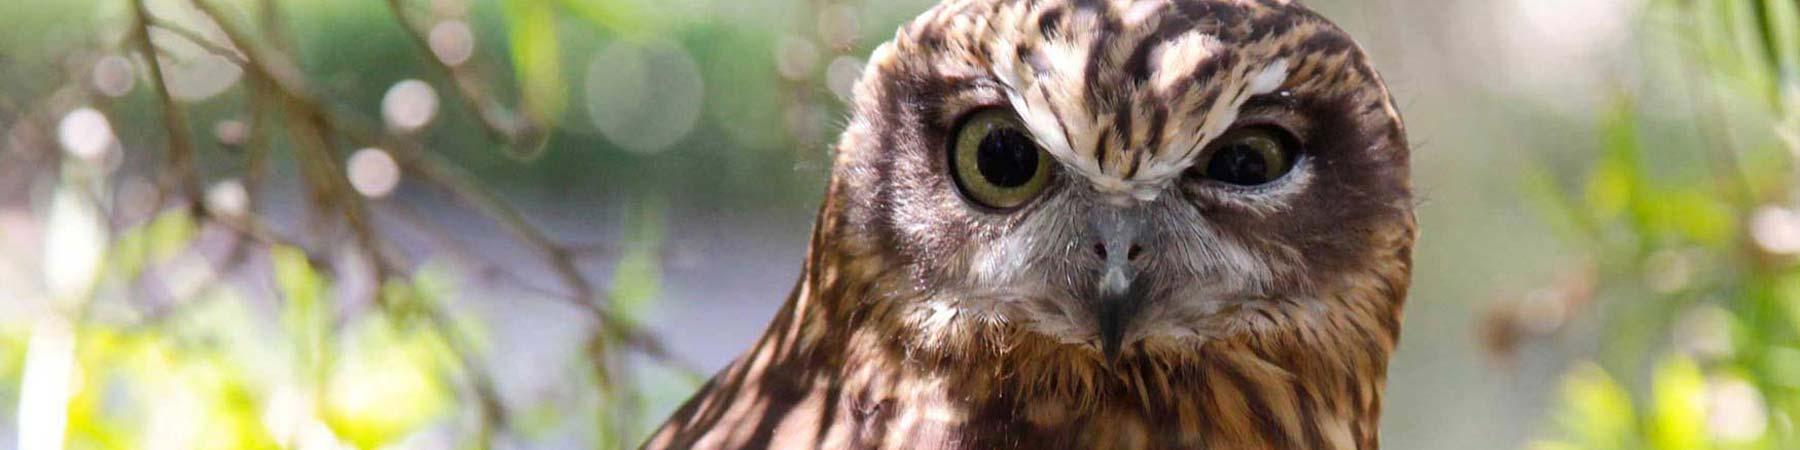 Bird watching 1